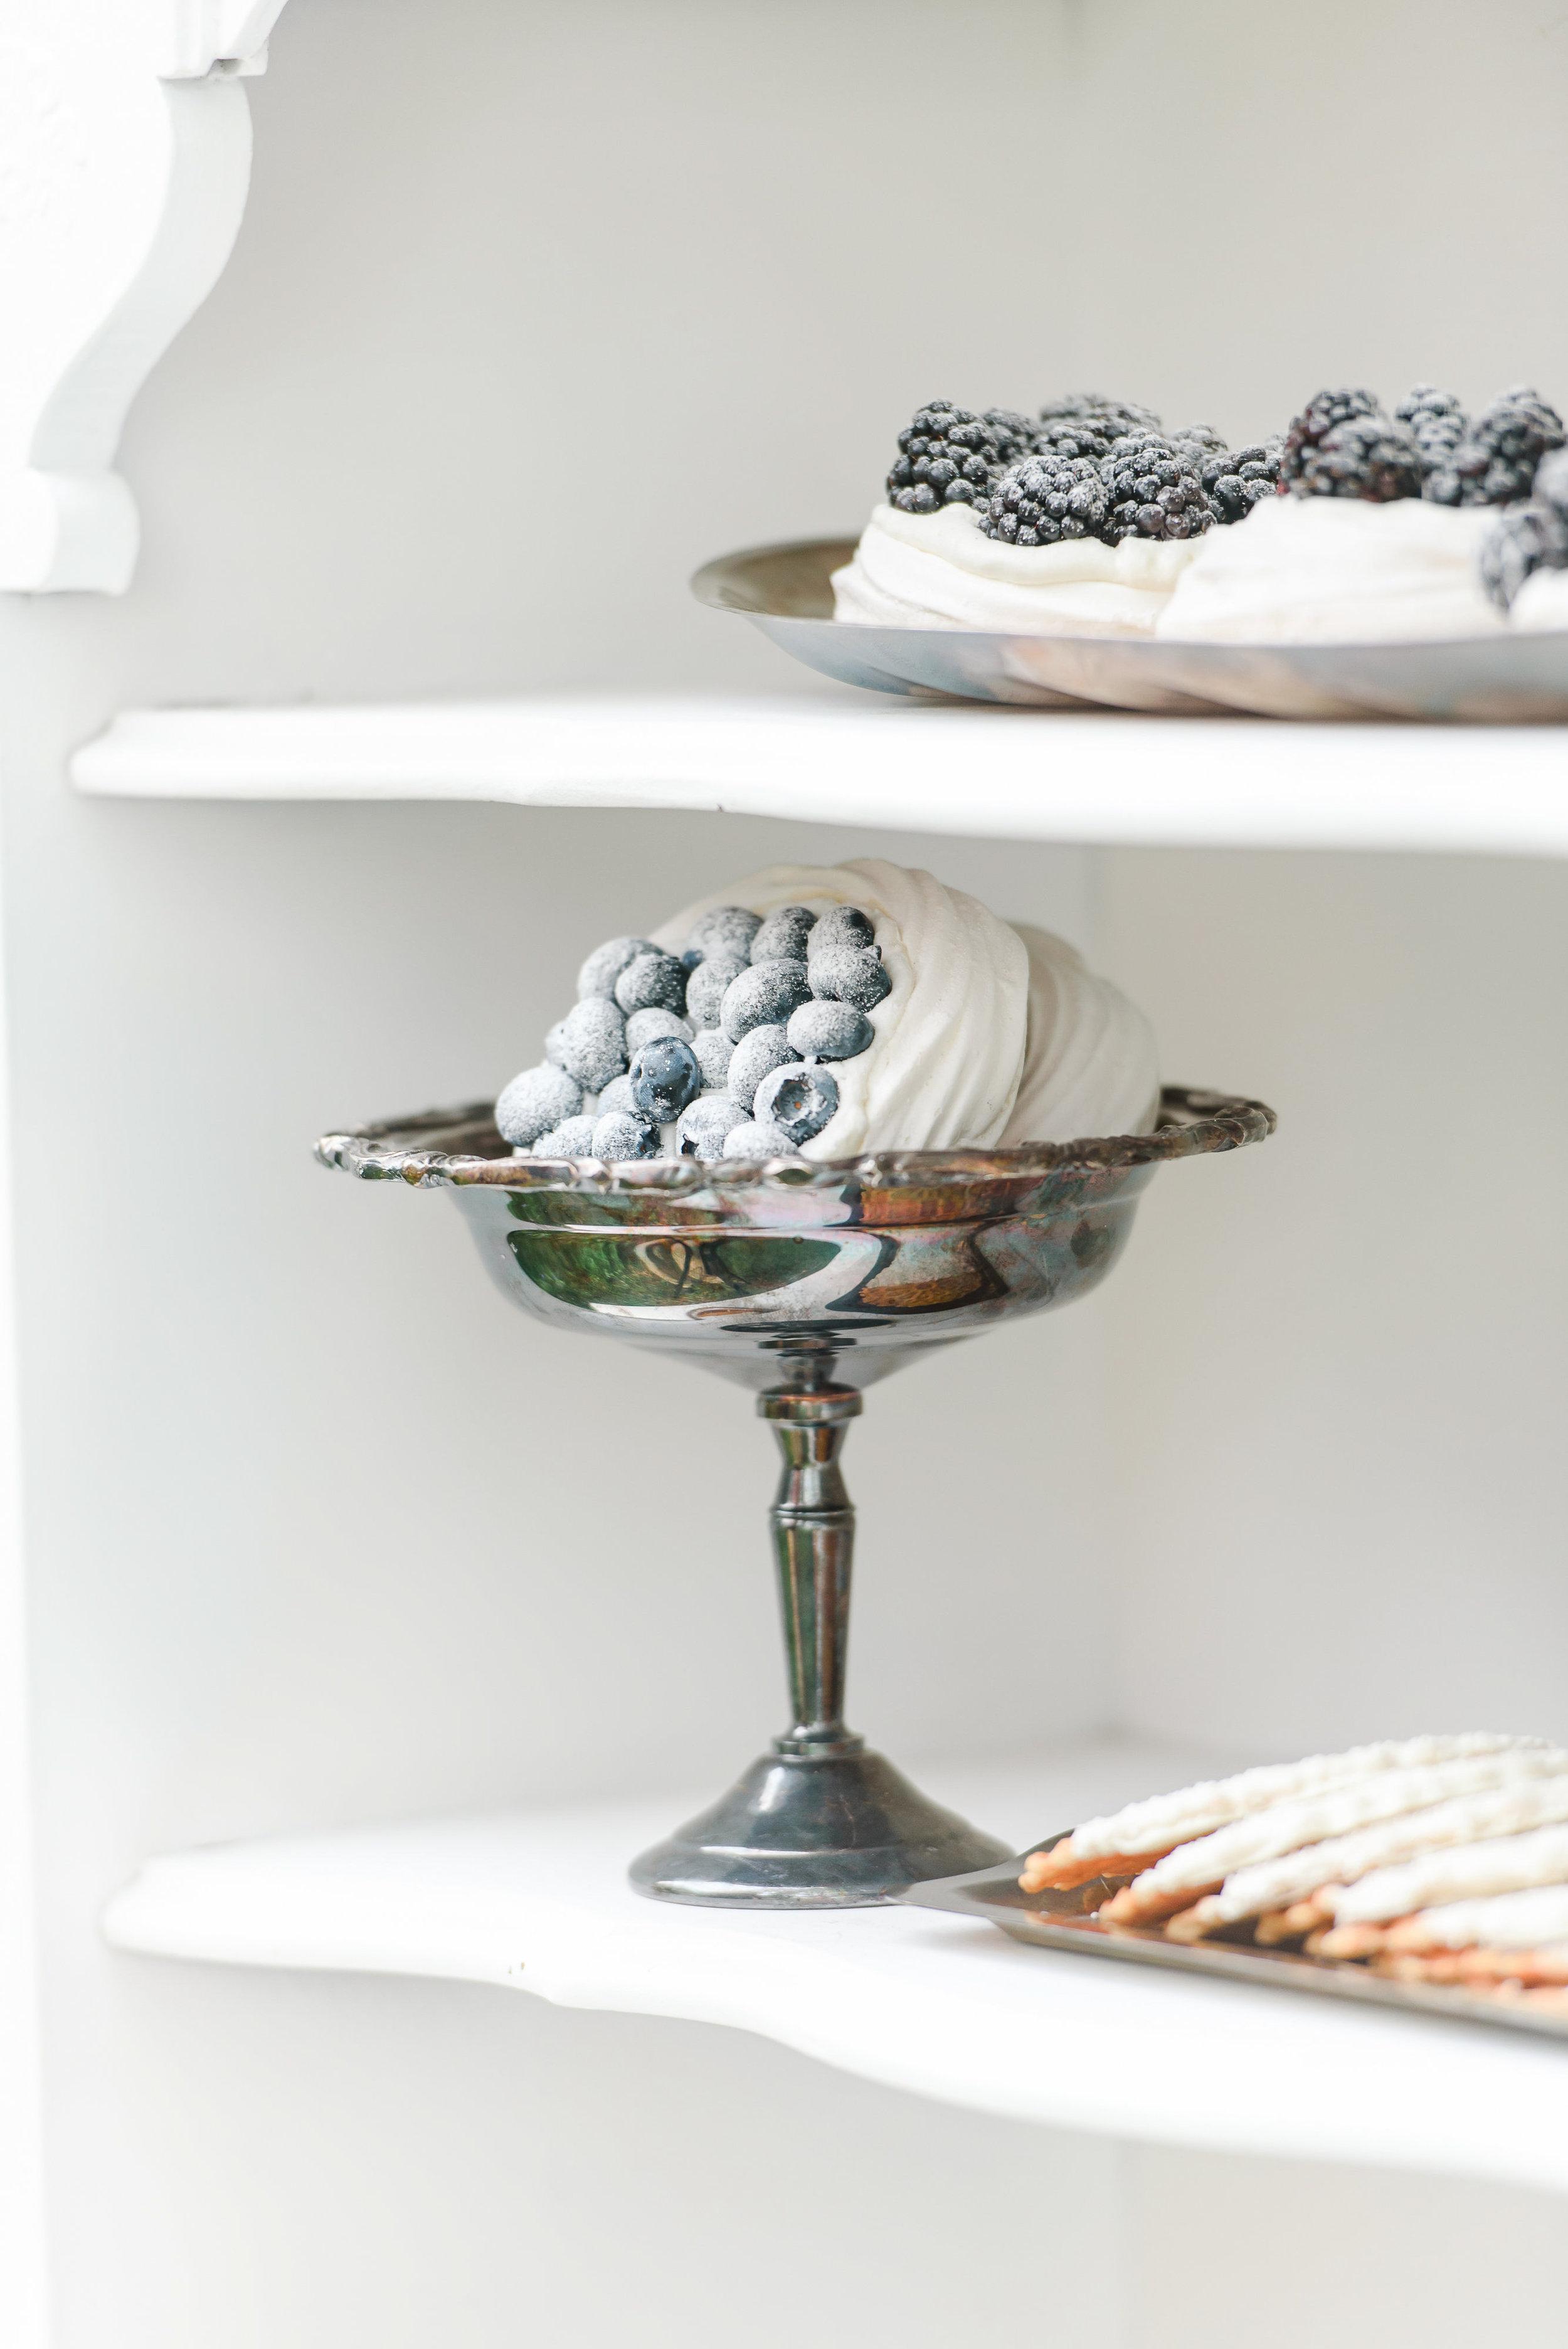 Wedding Dessert Bar | Blueberry Pavlova | Blueberry Desserts